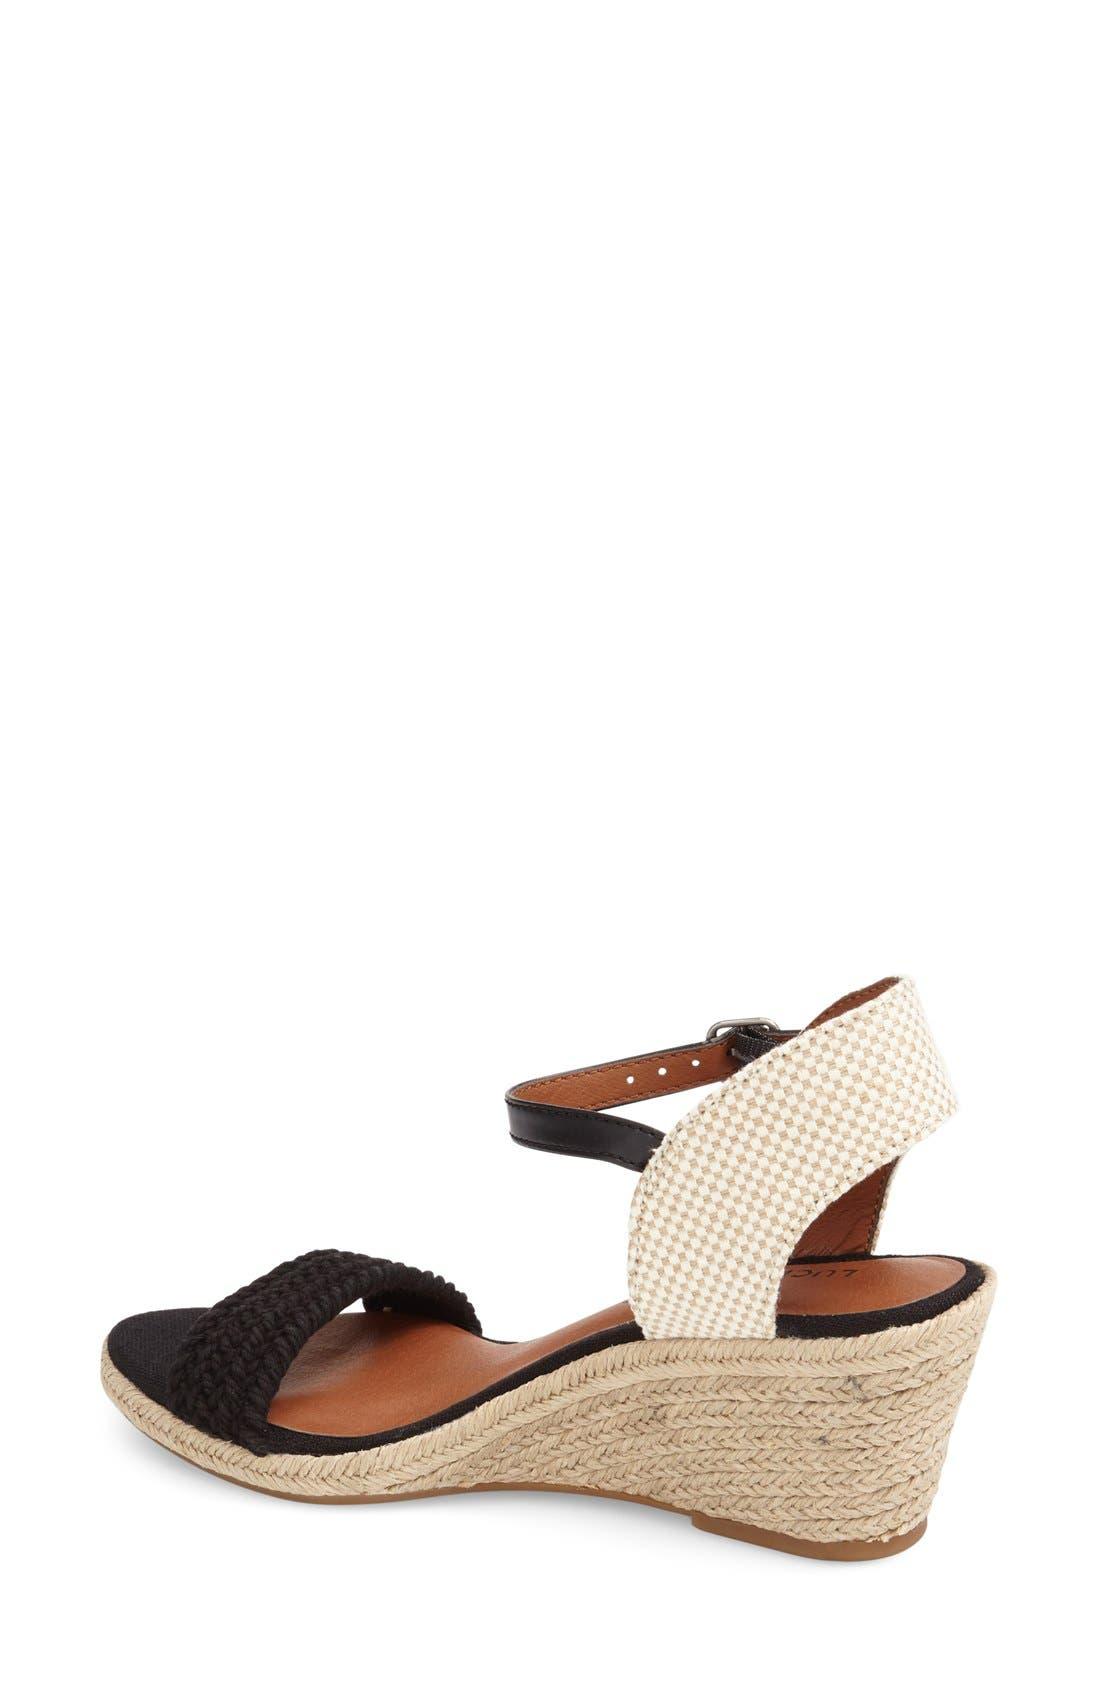 'Katereena' Wedge Sandal,                             Alternate thumbnail 4, color,                             001